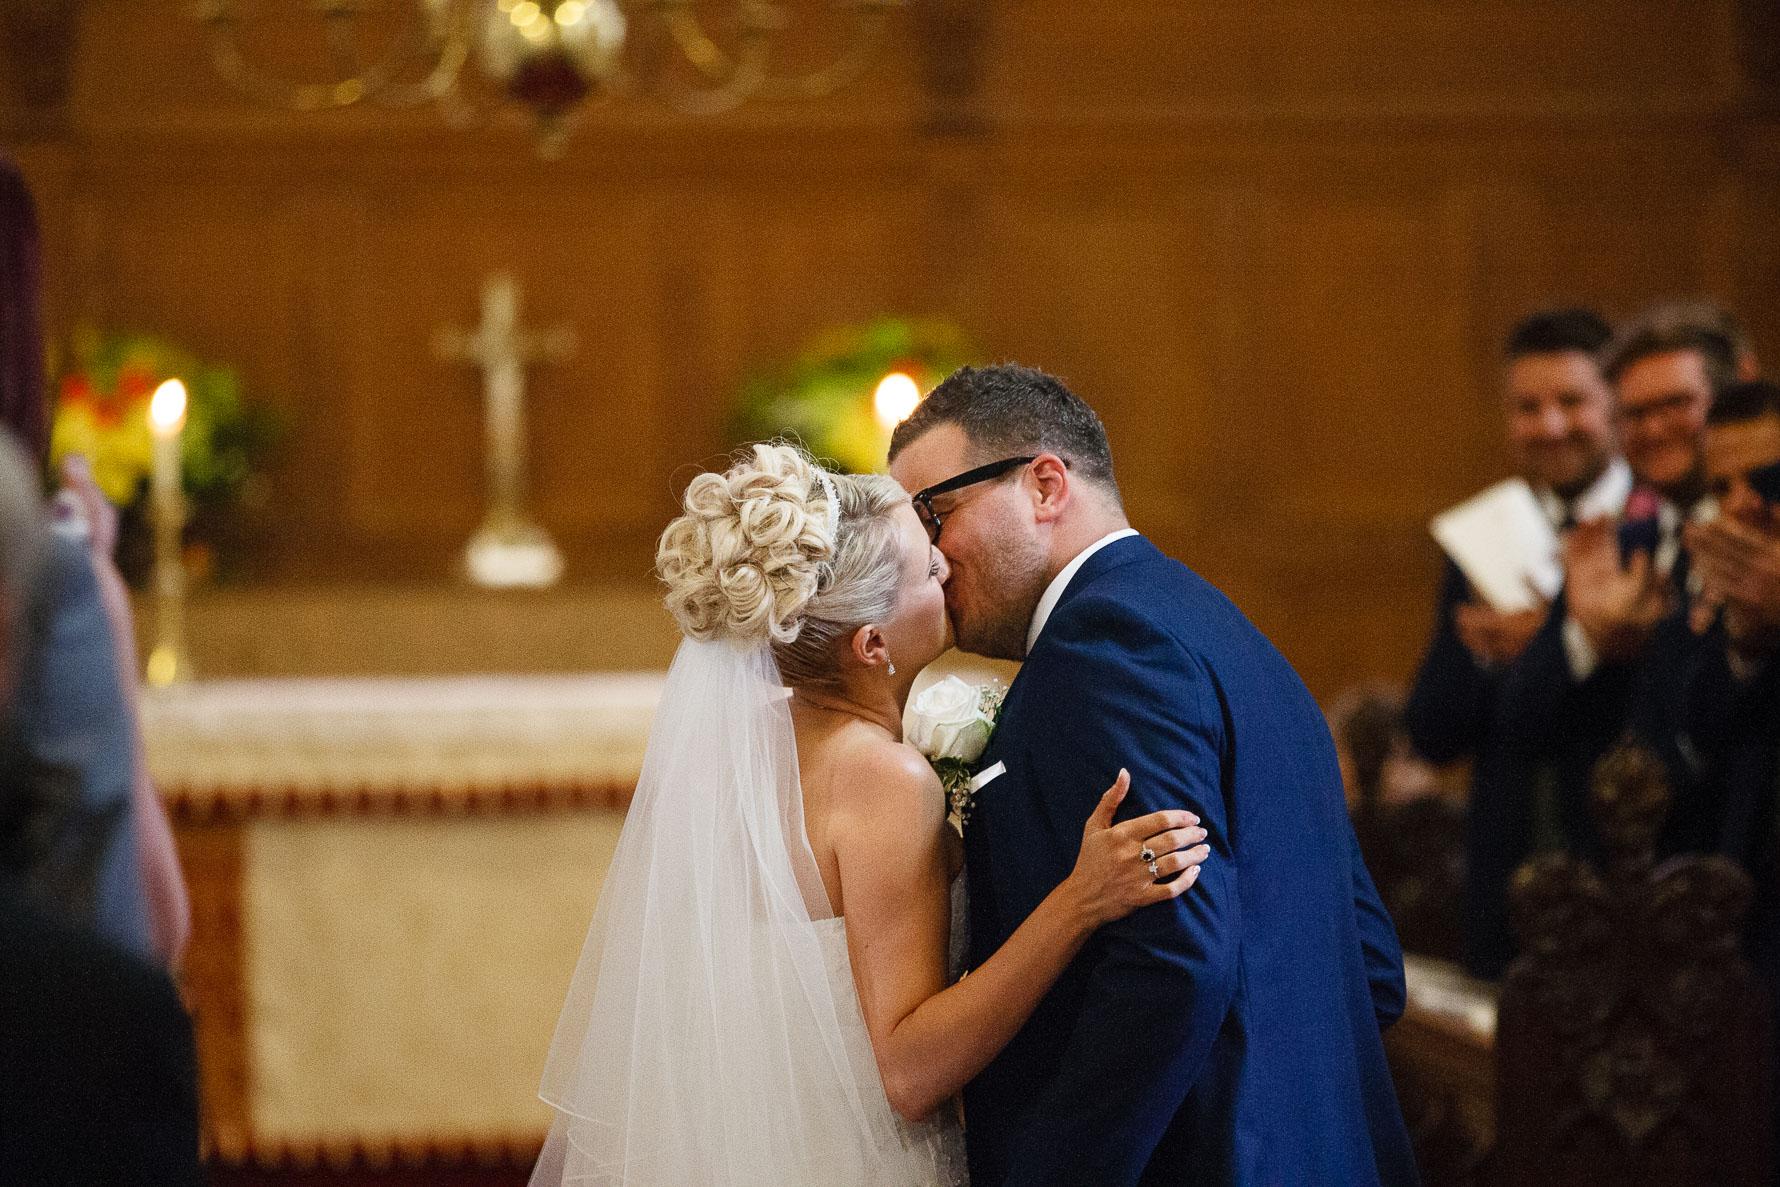 Canterbury Cathedral Lodge Wedding31-20141004 0488